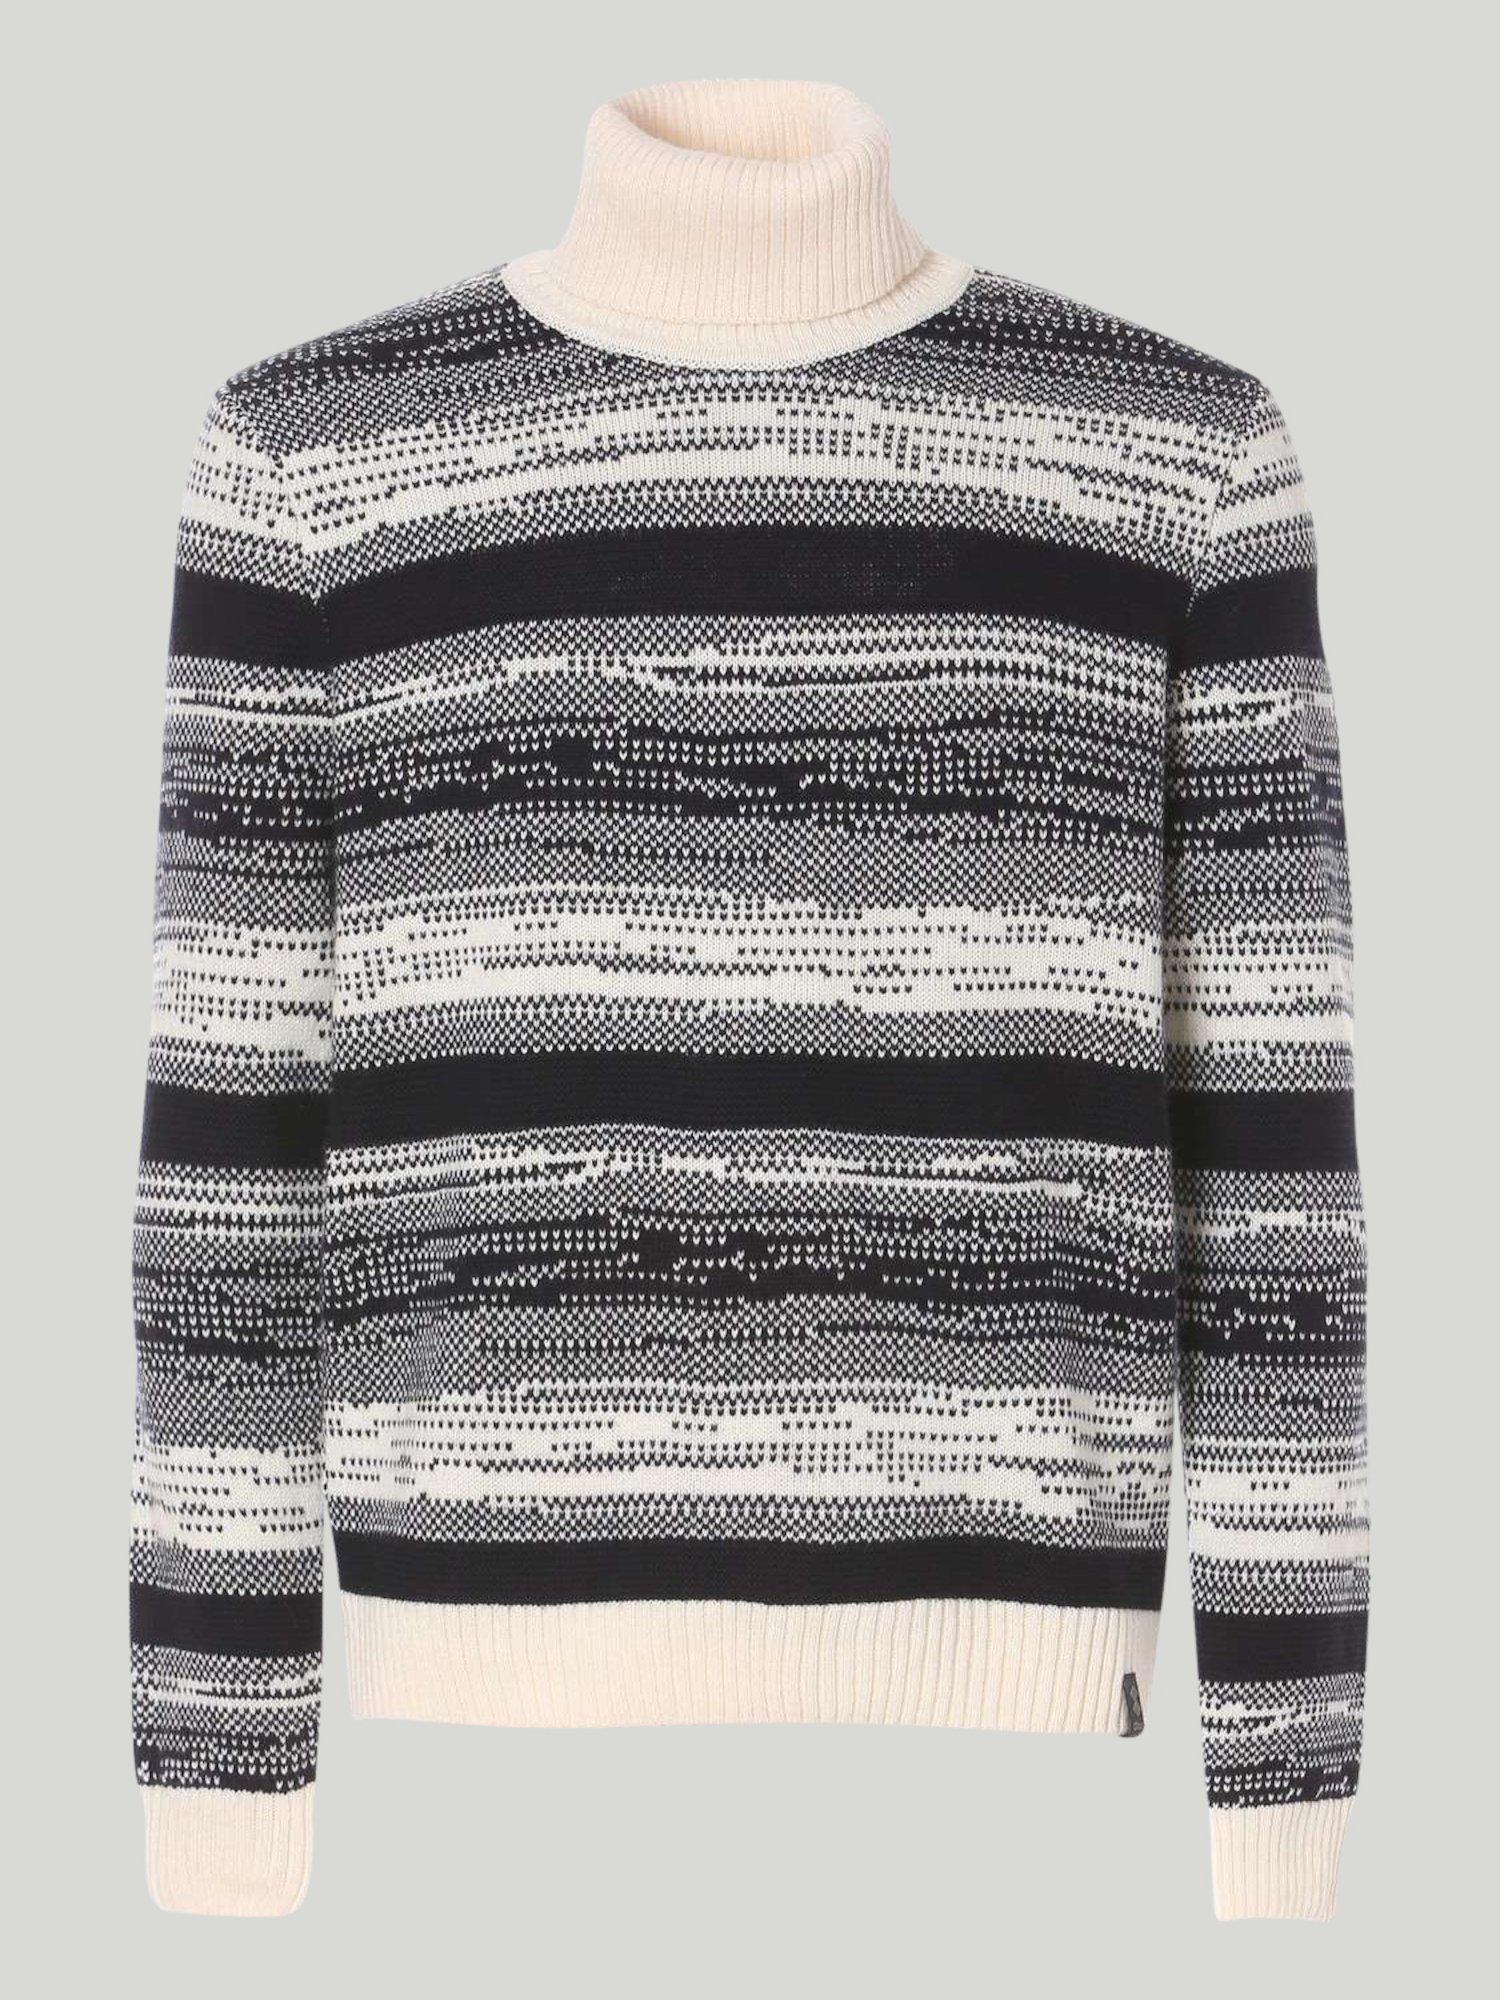 Winch Sweater - White / Navy